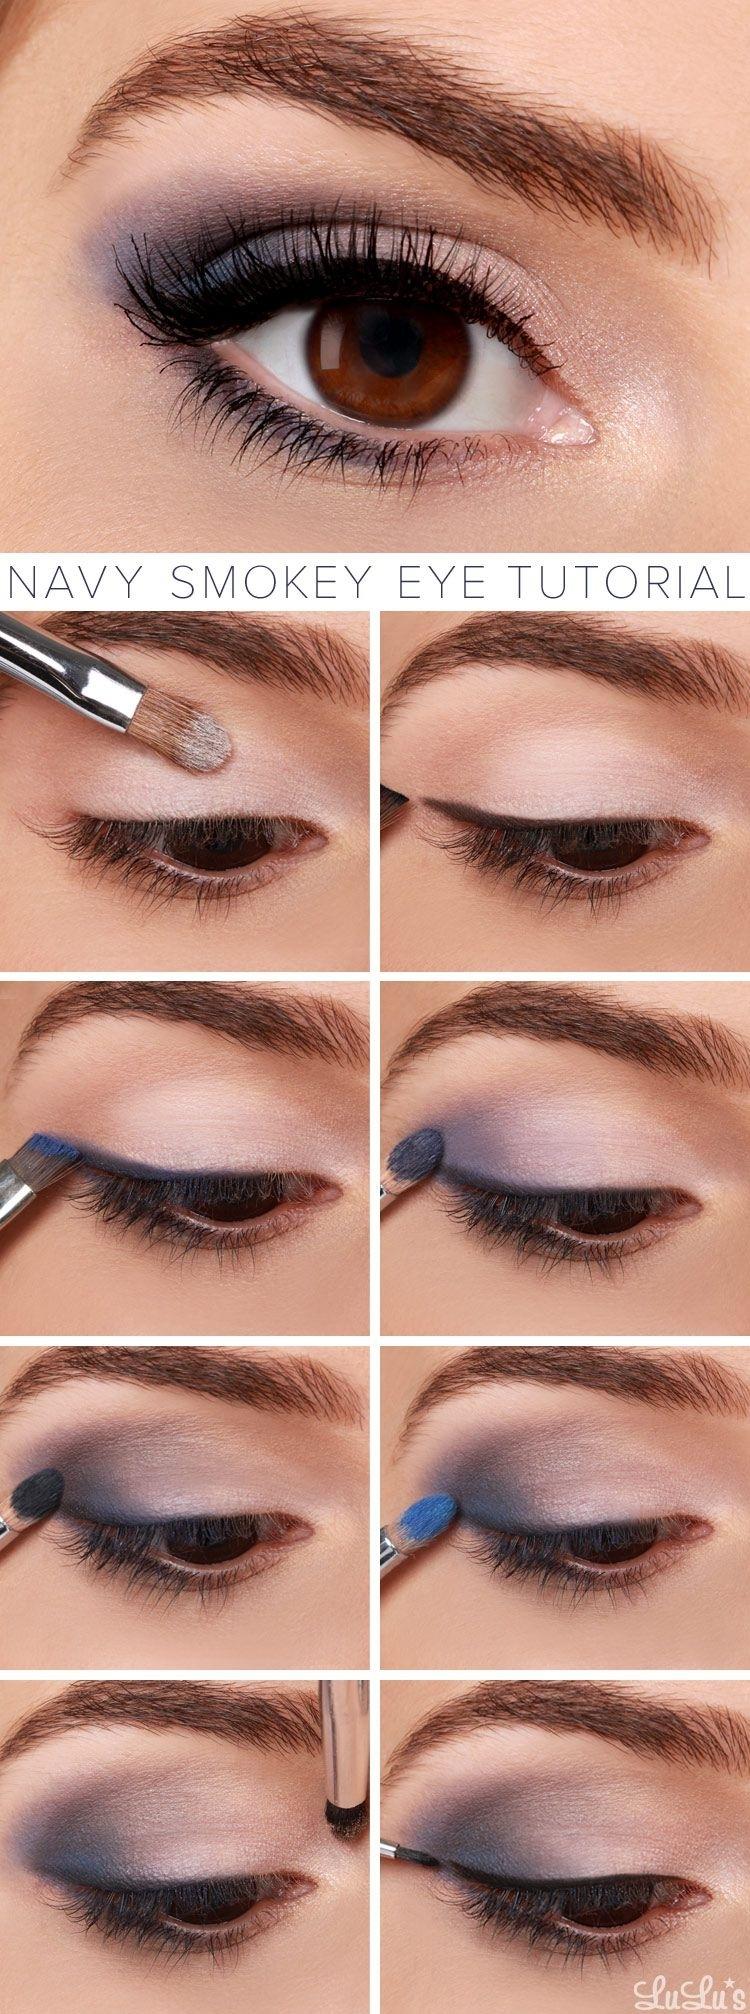 Lulus How-To: Navy Smokey Eye Makeup Tutorial | Makeup Ideas intended for Smokey Eye Makeup Ideas Pinterest